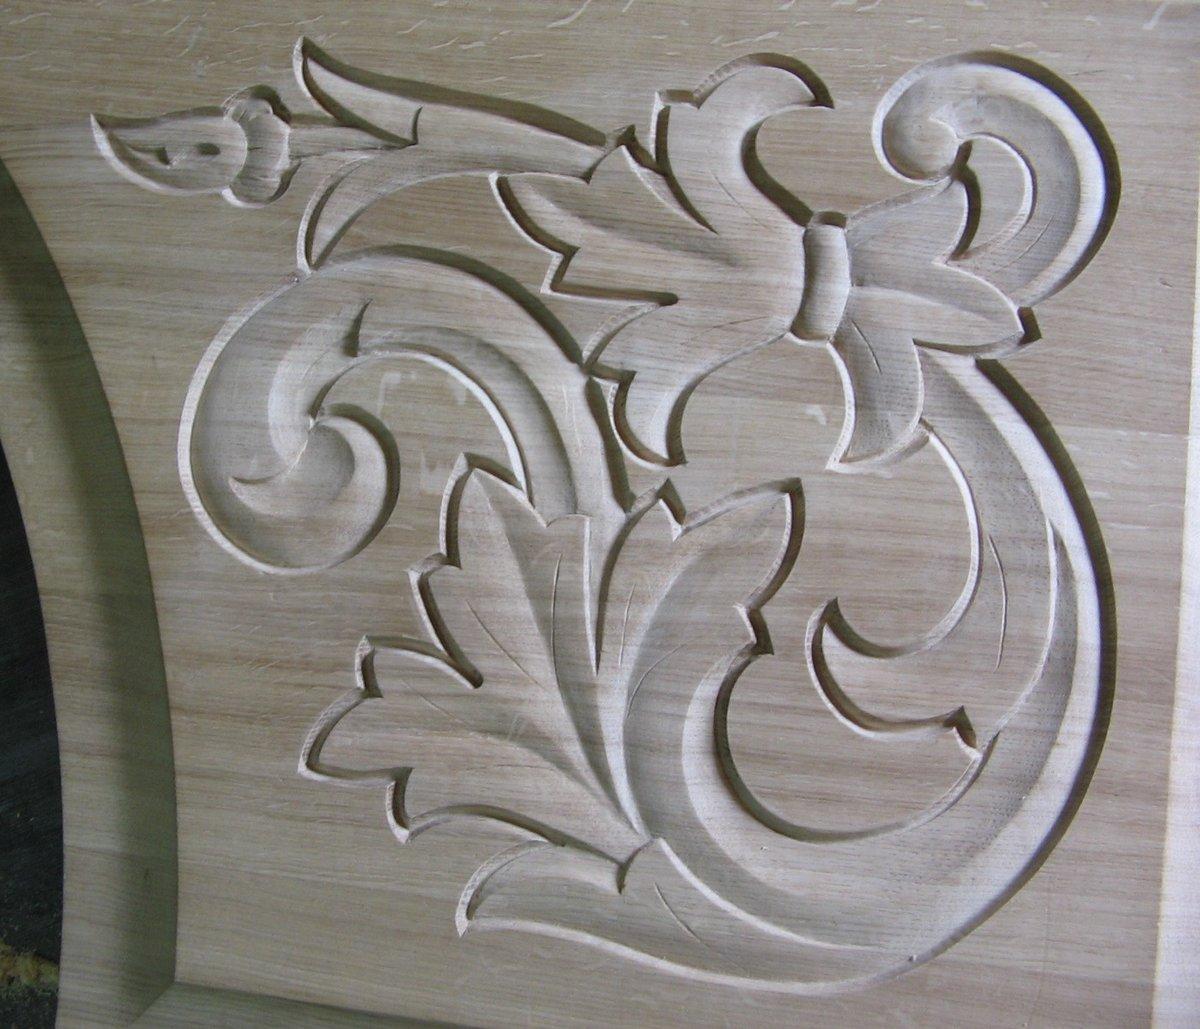 картинка узоры резьба пахла лесная малина